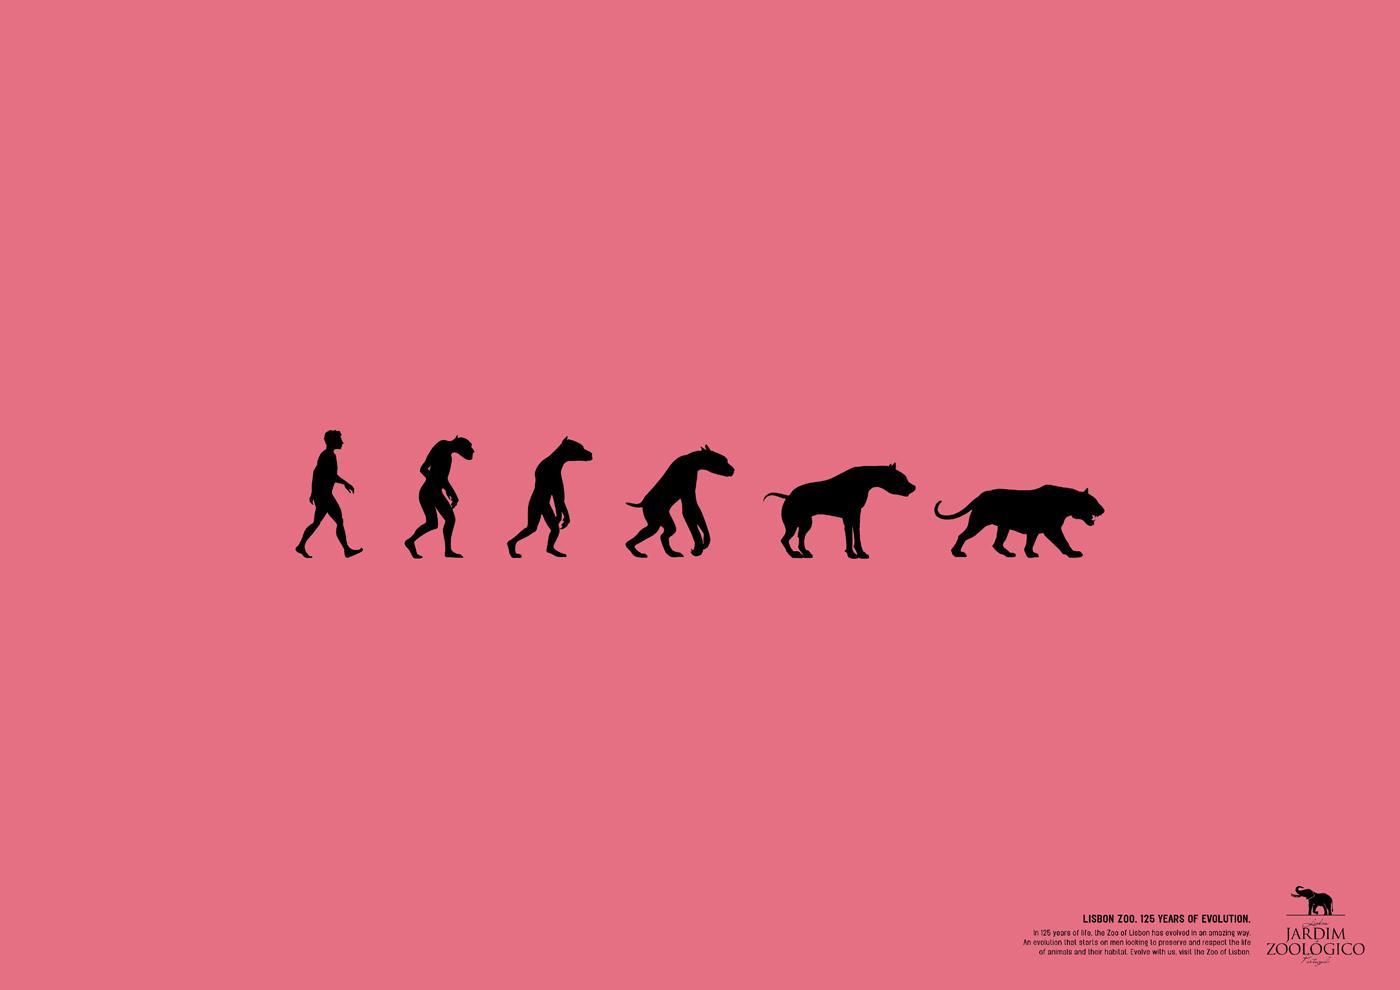 Lisbon Zoo Print Ad -  125 years of evolution, 1